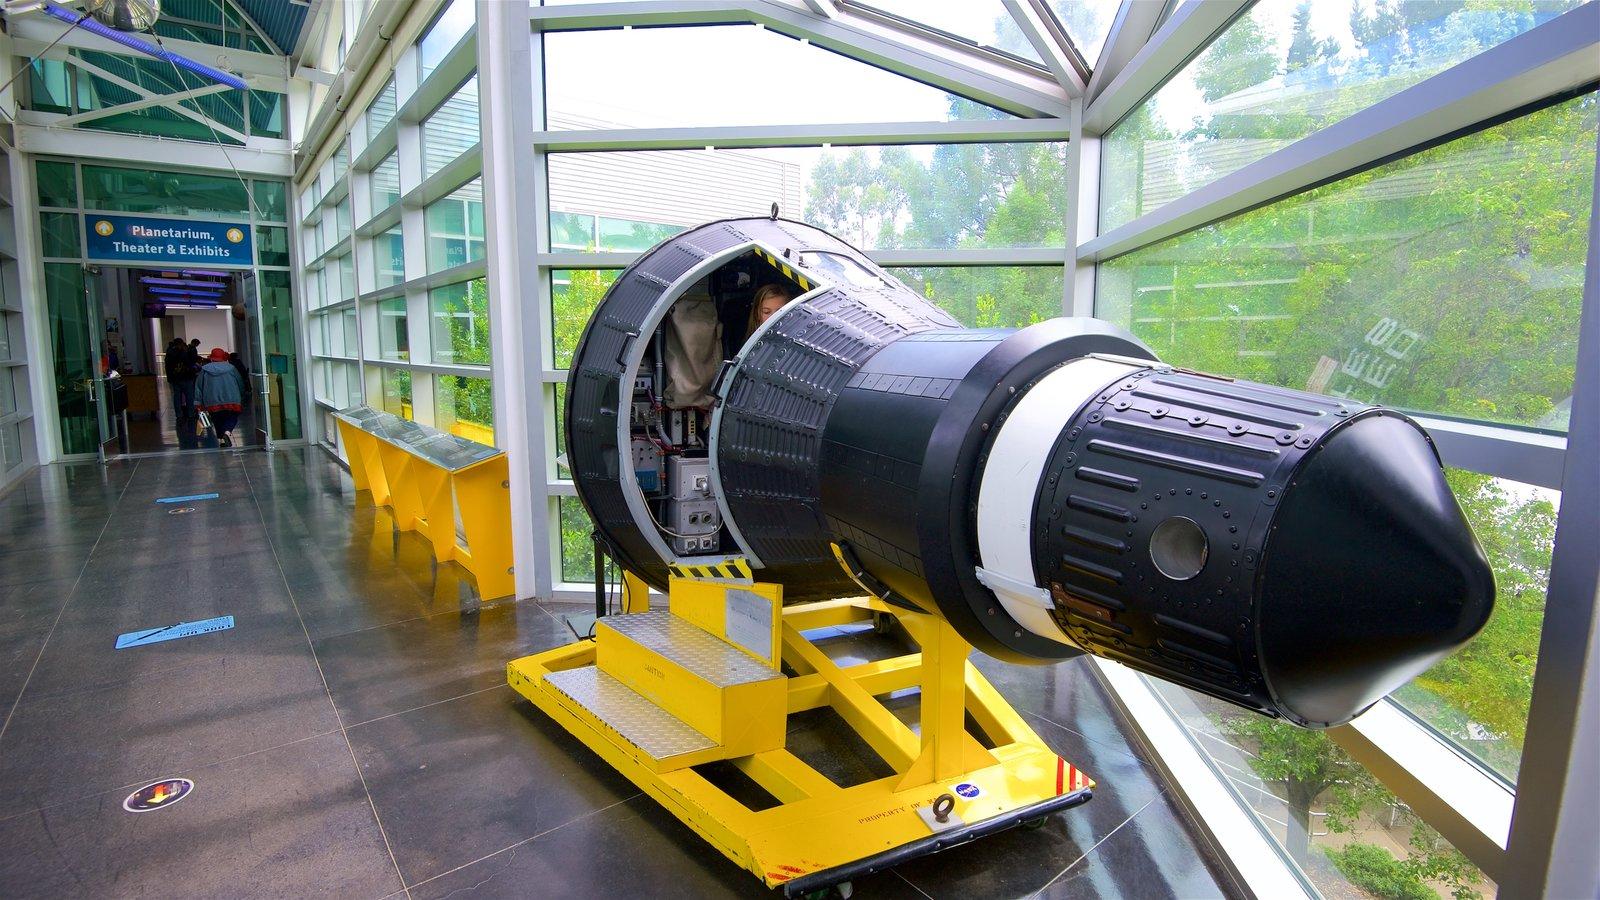 Chabot Space and Science Center que inclui vistas internas